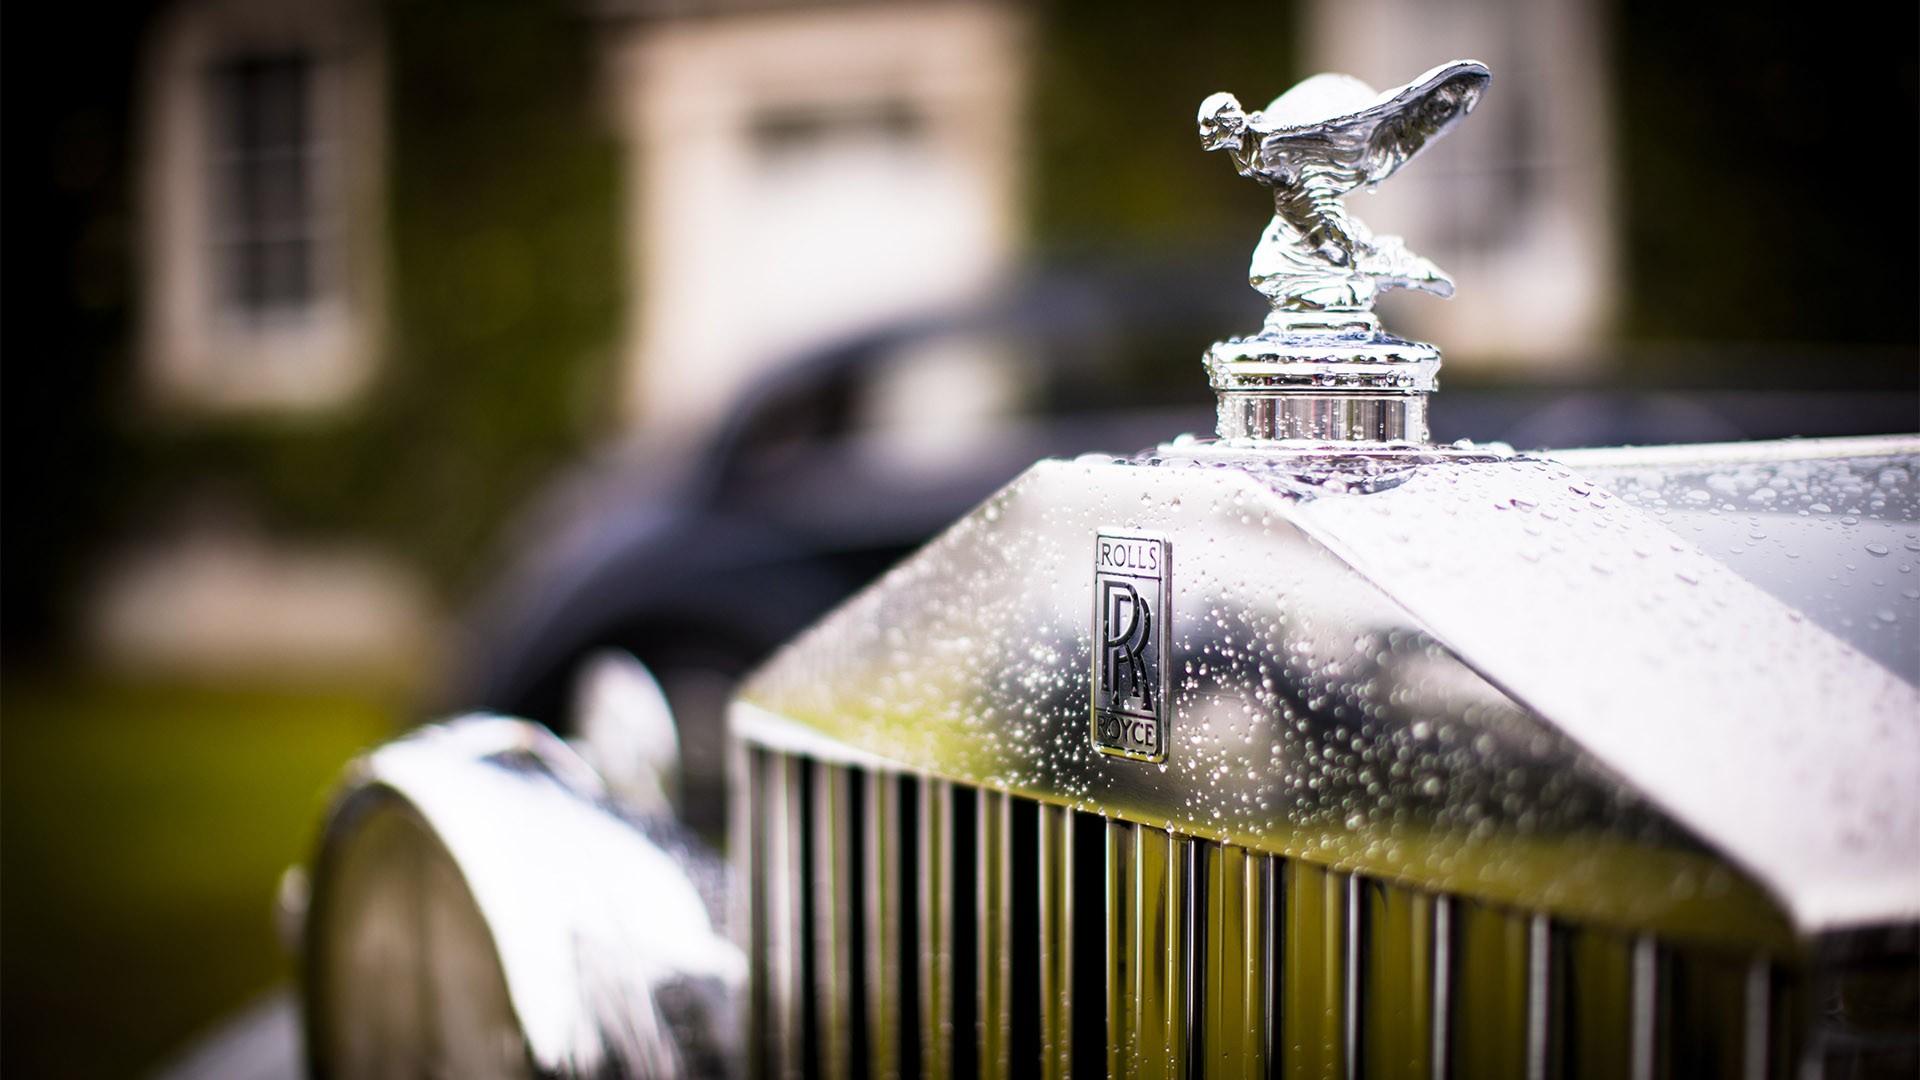 Goodwood Festival of Speed Rolls-Royce